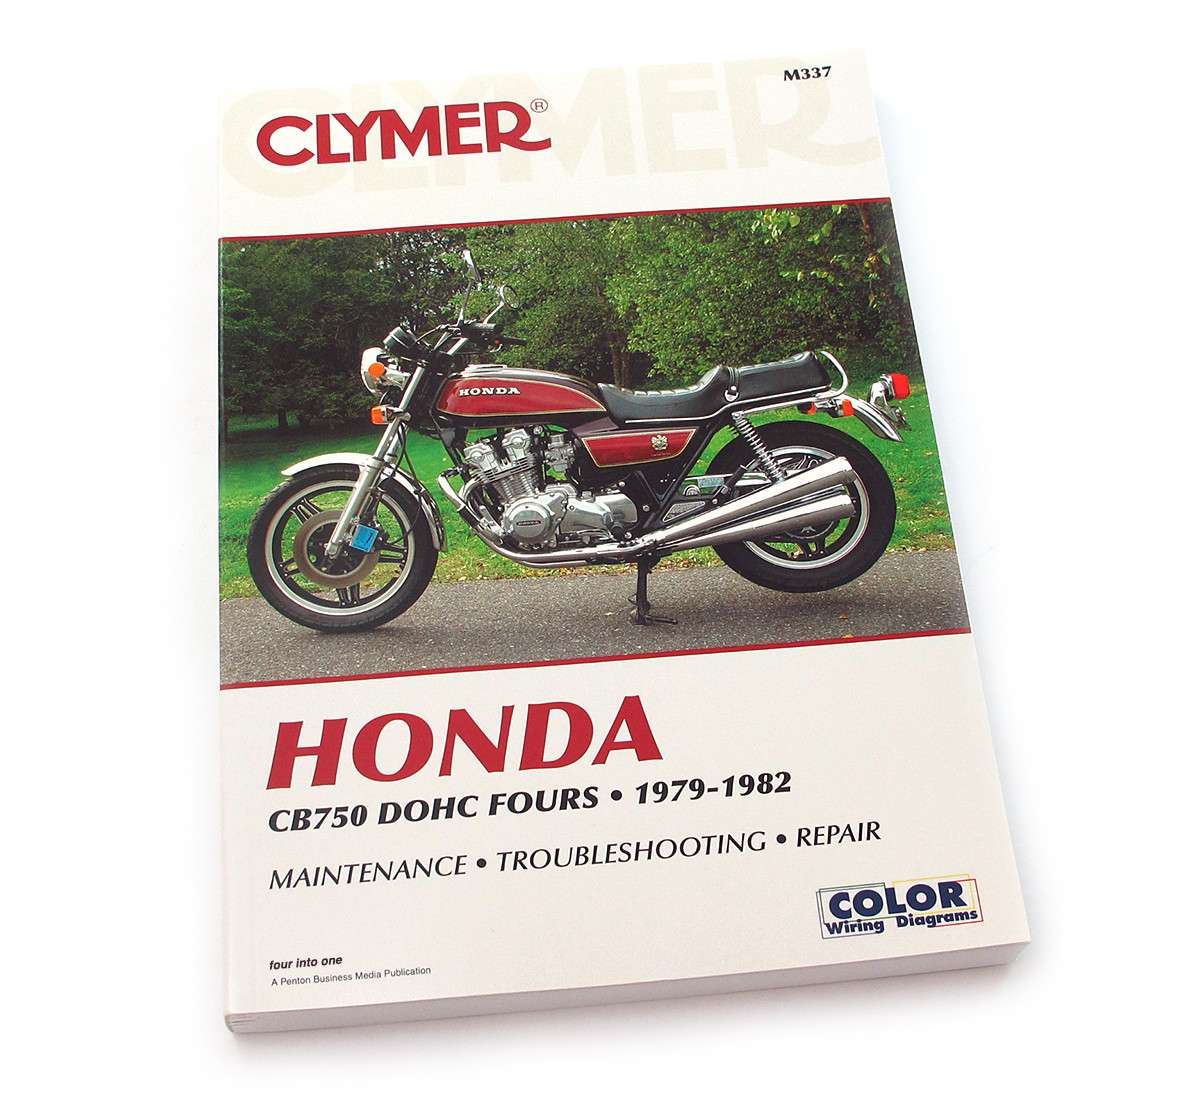 1979 Suzuki Rm125 Wiring Diagram Trusted Diagrams Gs1000 Honda Cb750 Electrical